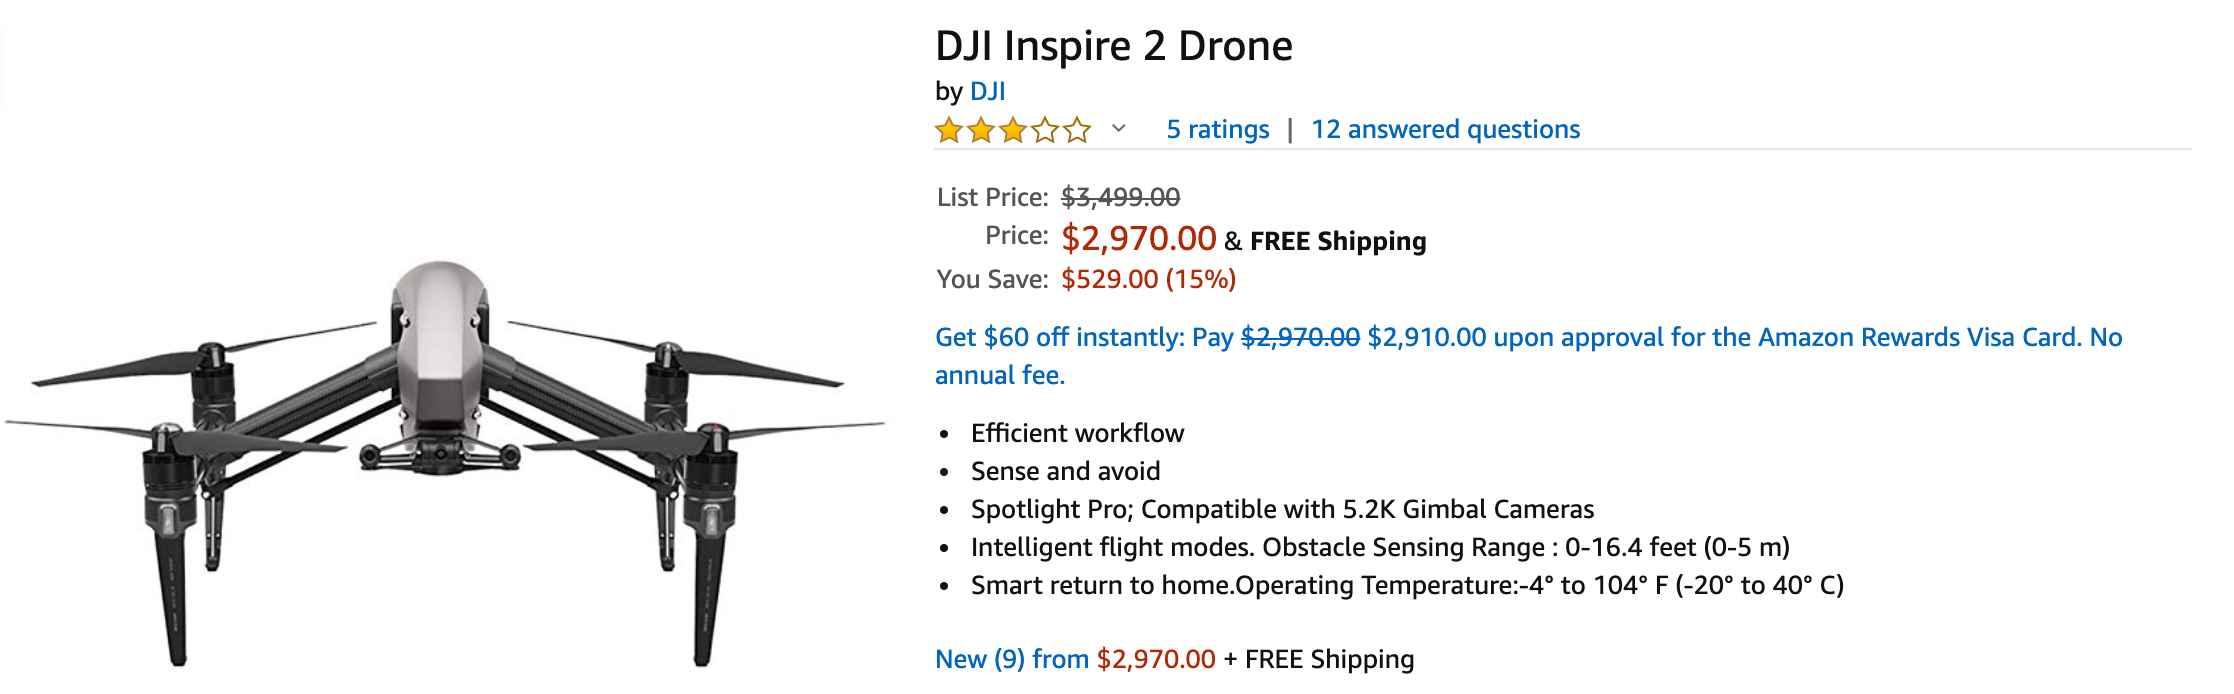 DJI-Inspire-2-Drone